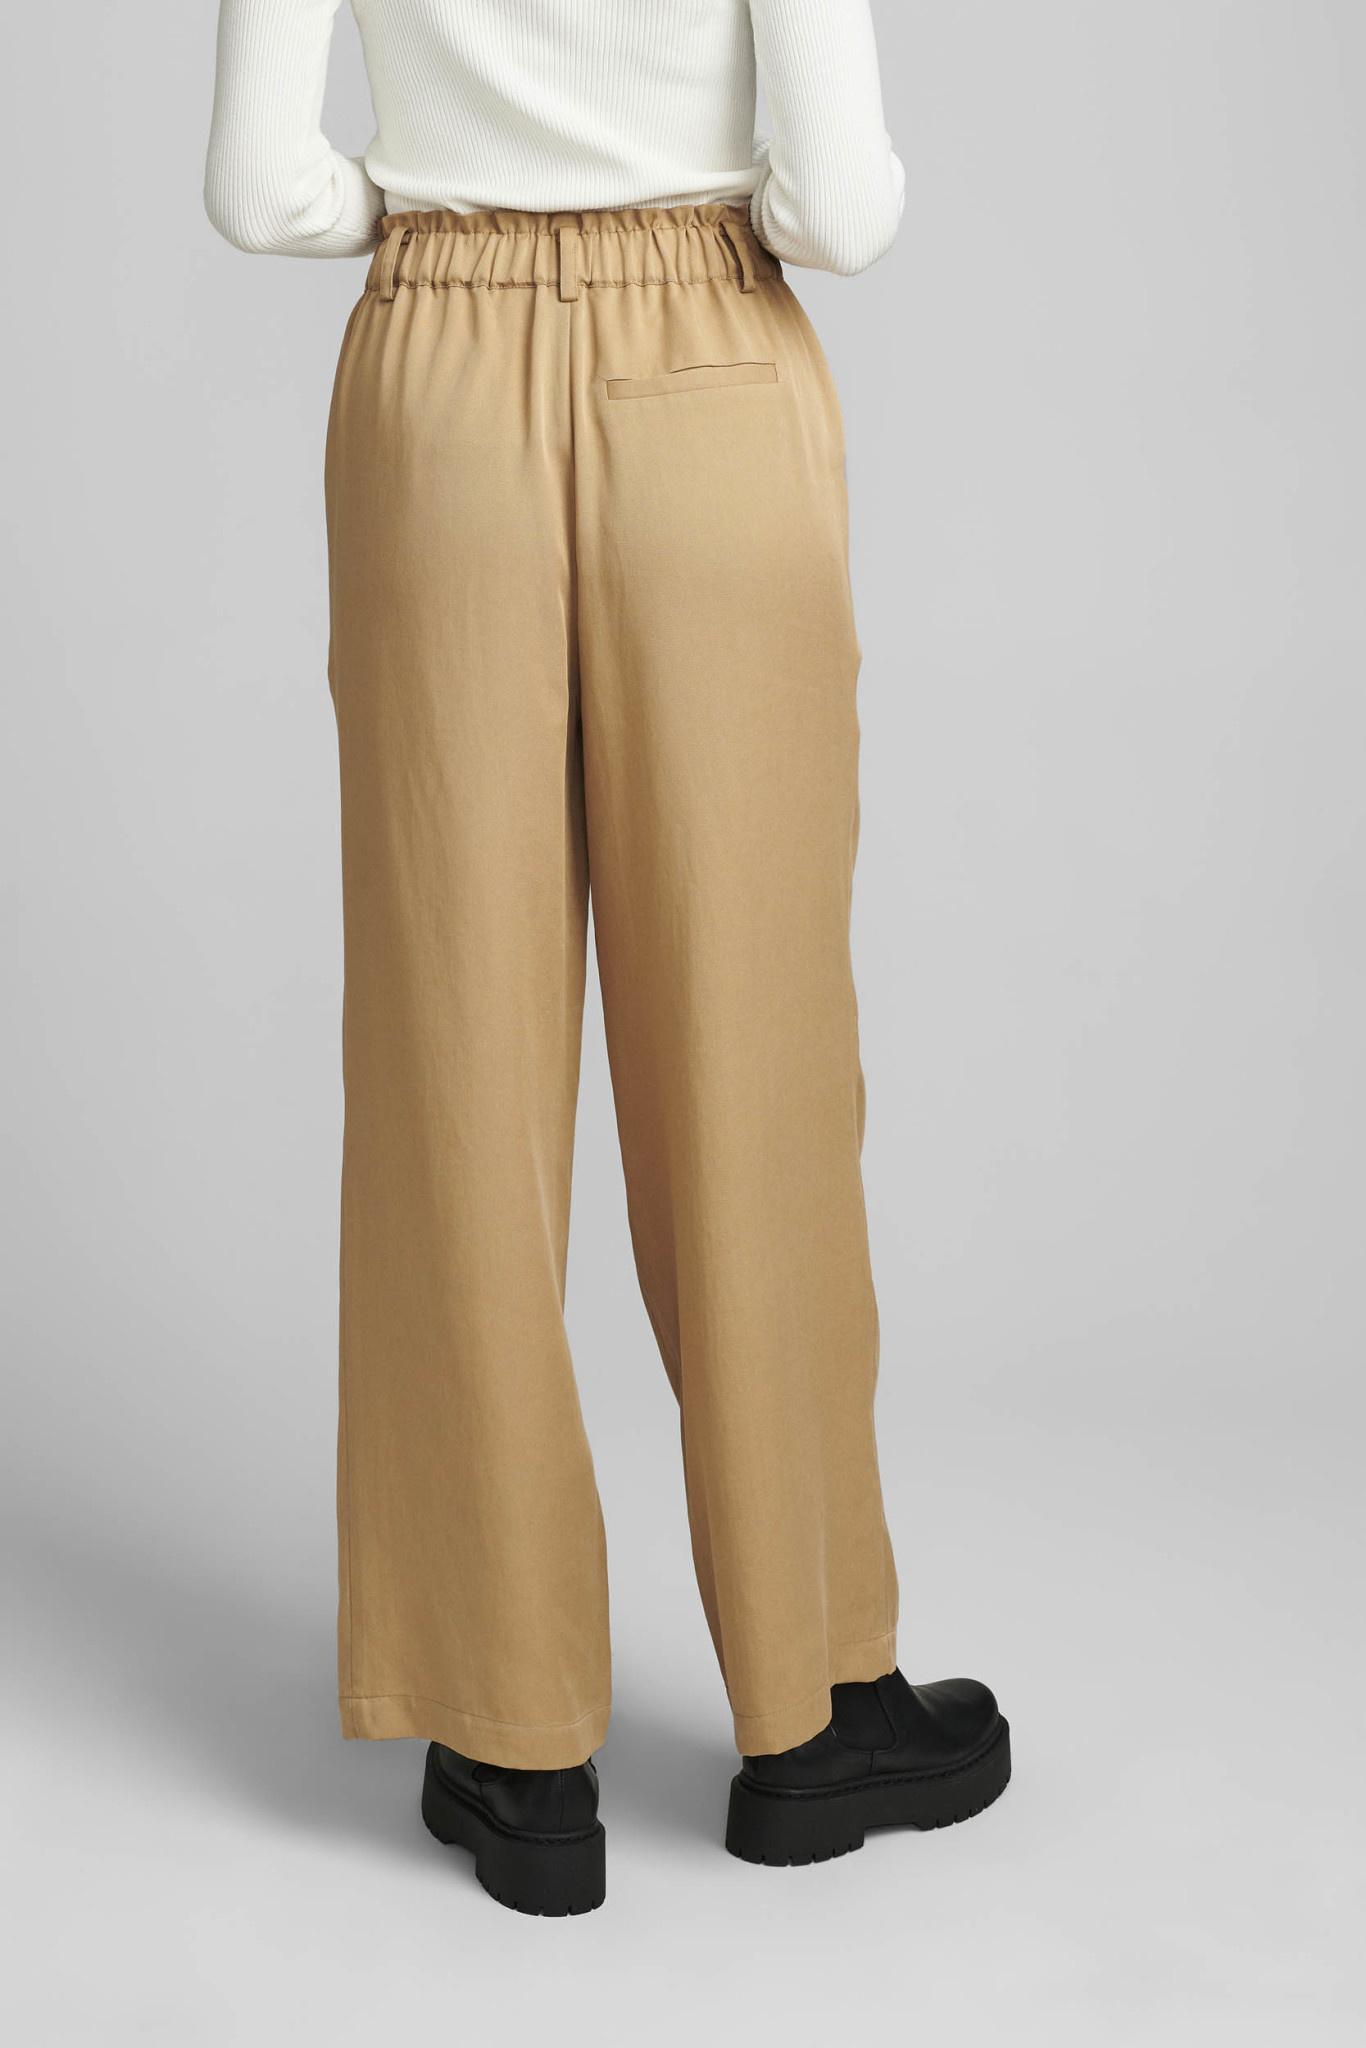 Nümph Chava Pants